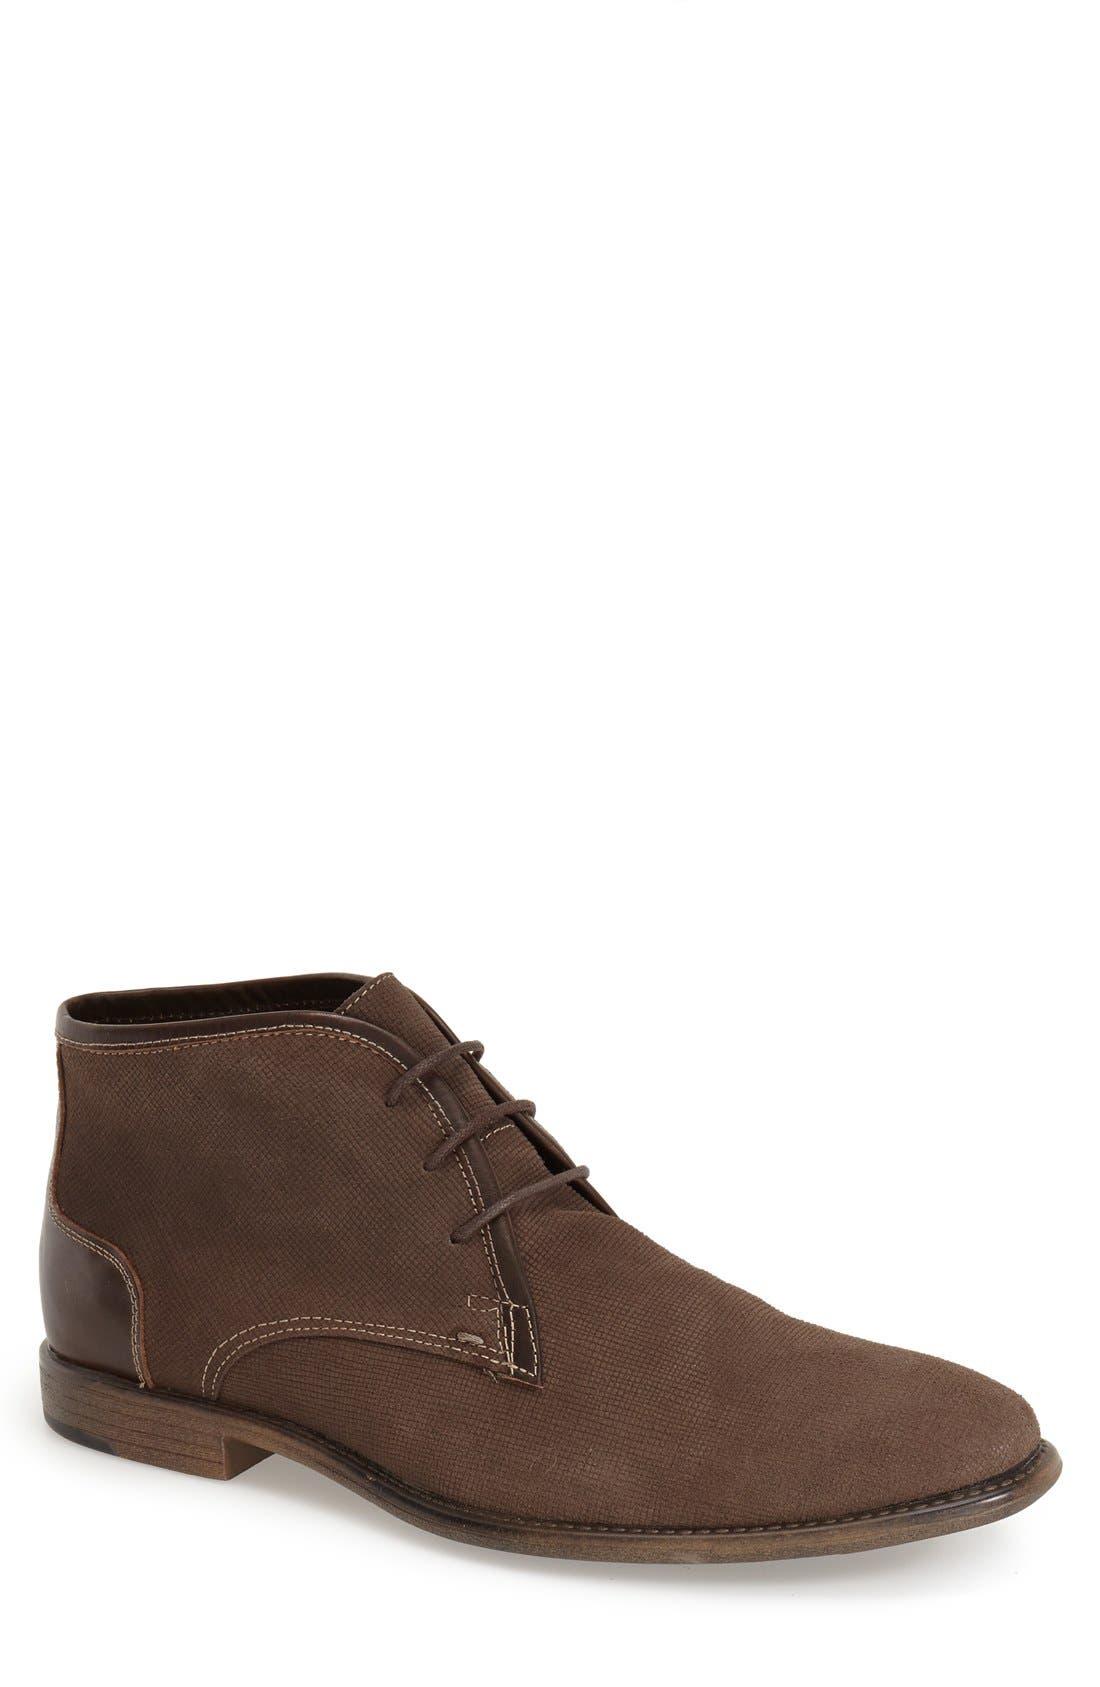 'Graham' Chukka Boot, Main, color, 208